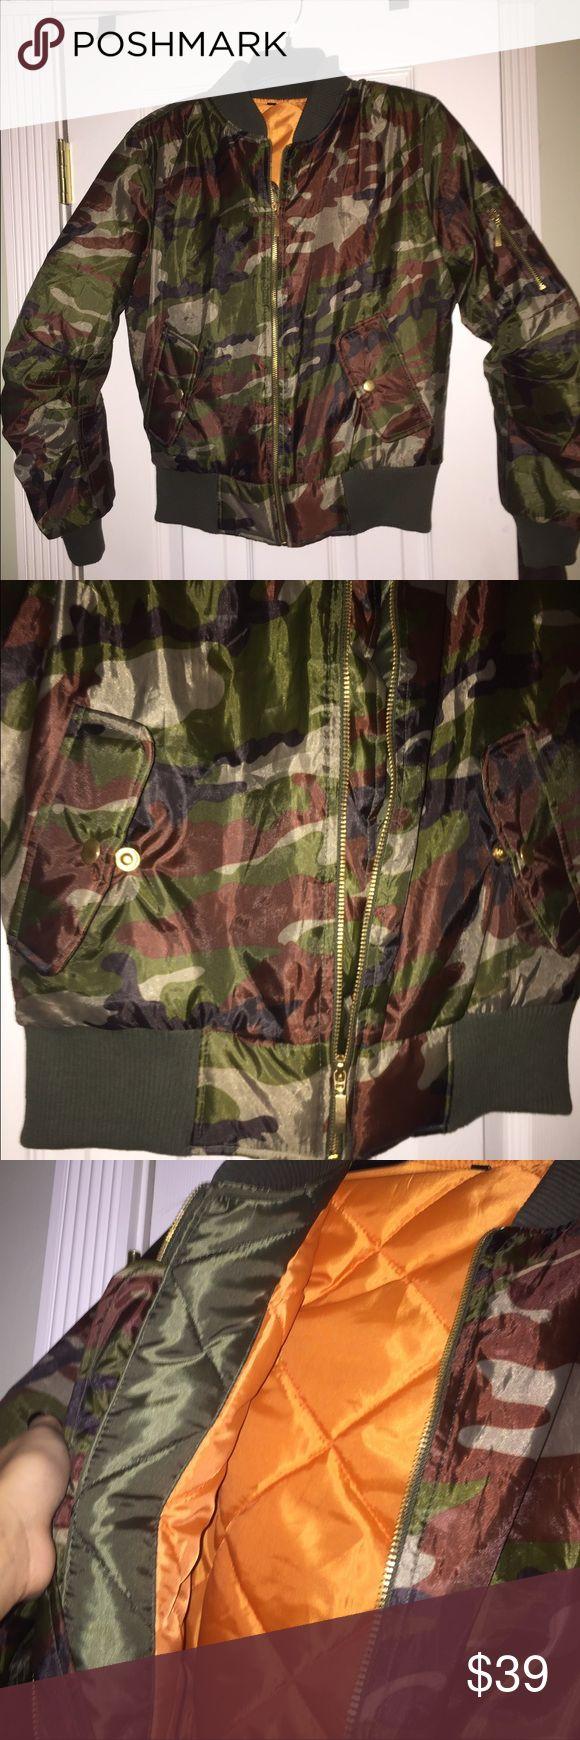 Booho Camo combat jacket Camo combat jacket; never worn. tags are off though thinking i'd like. size Xsmall. zipper on the side on the arm. NO TRADES Boohoo Jackets & Coats